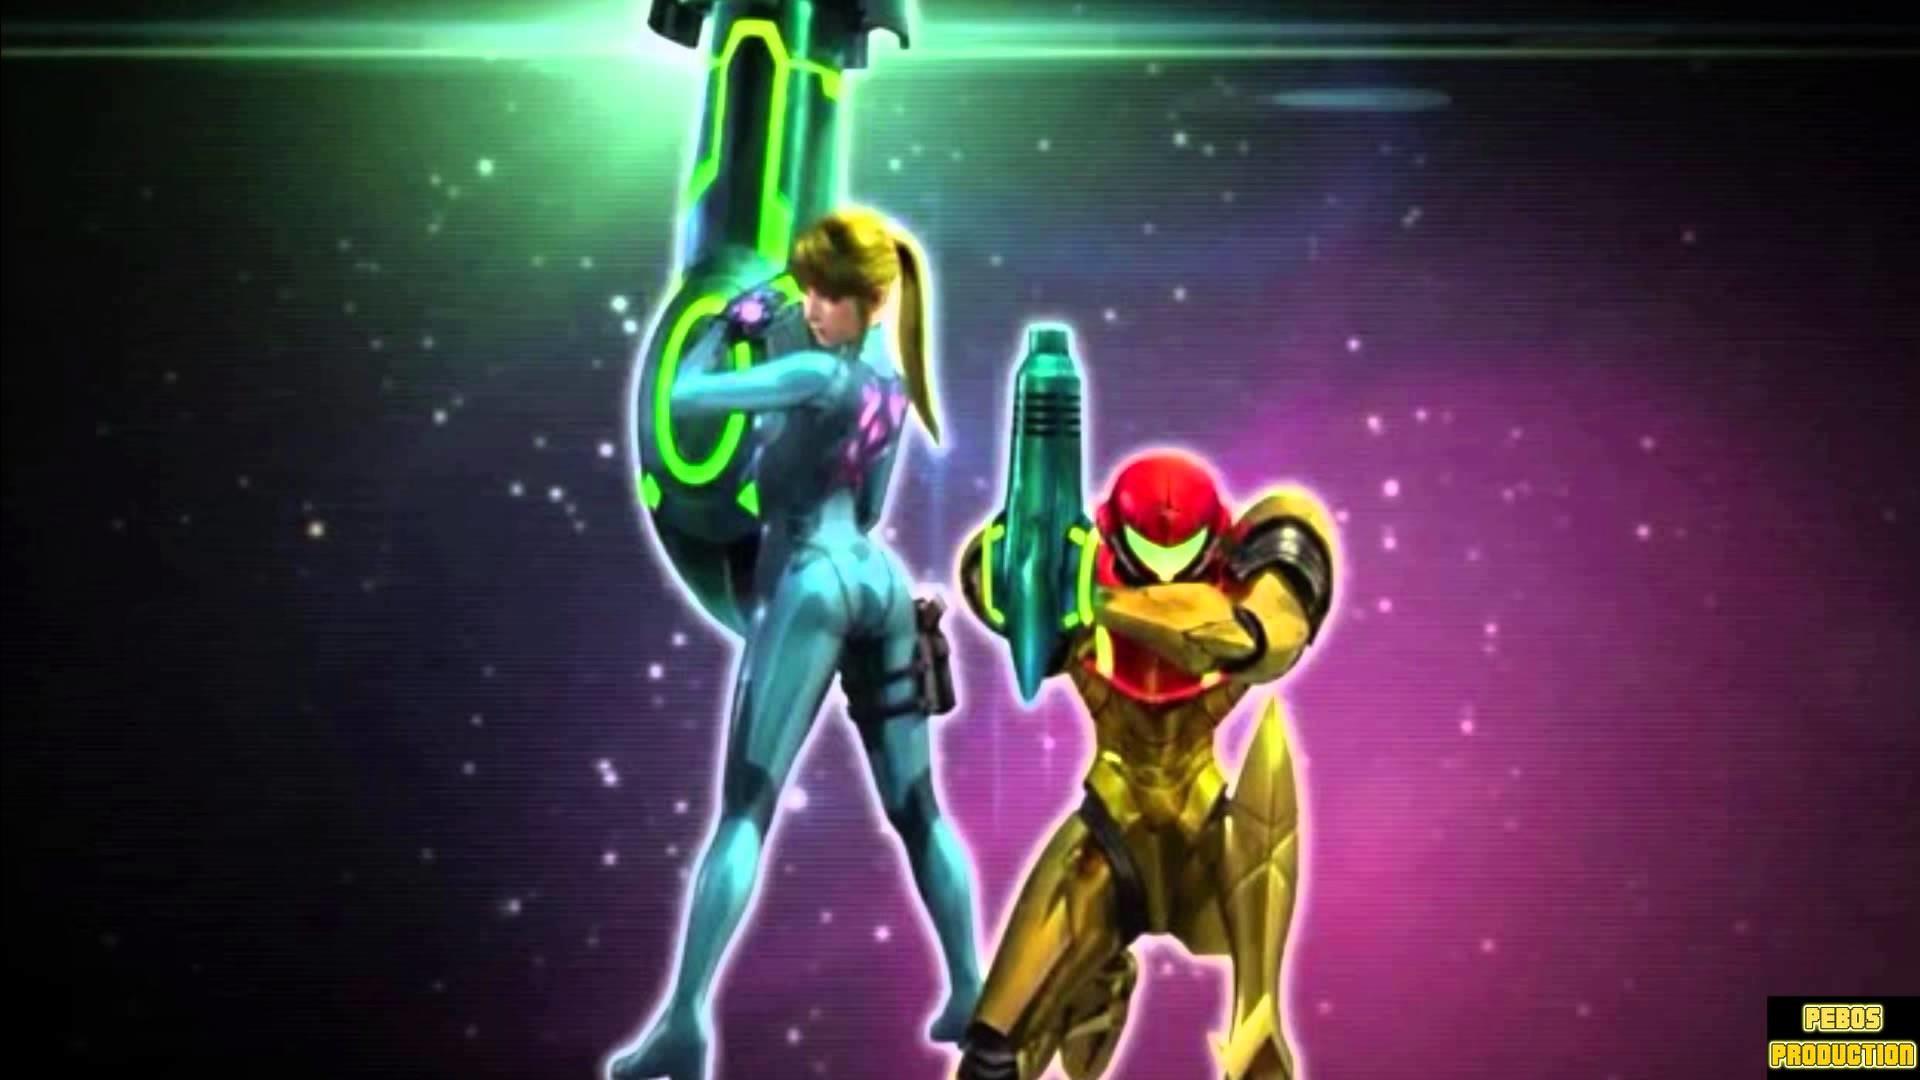 Zero Suit Samus And Samus Are Coming To Monster Hunter 4 Ultimate